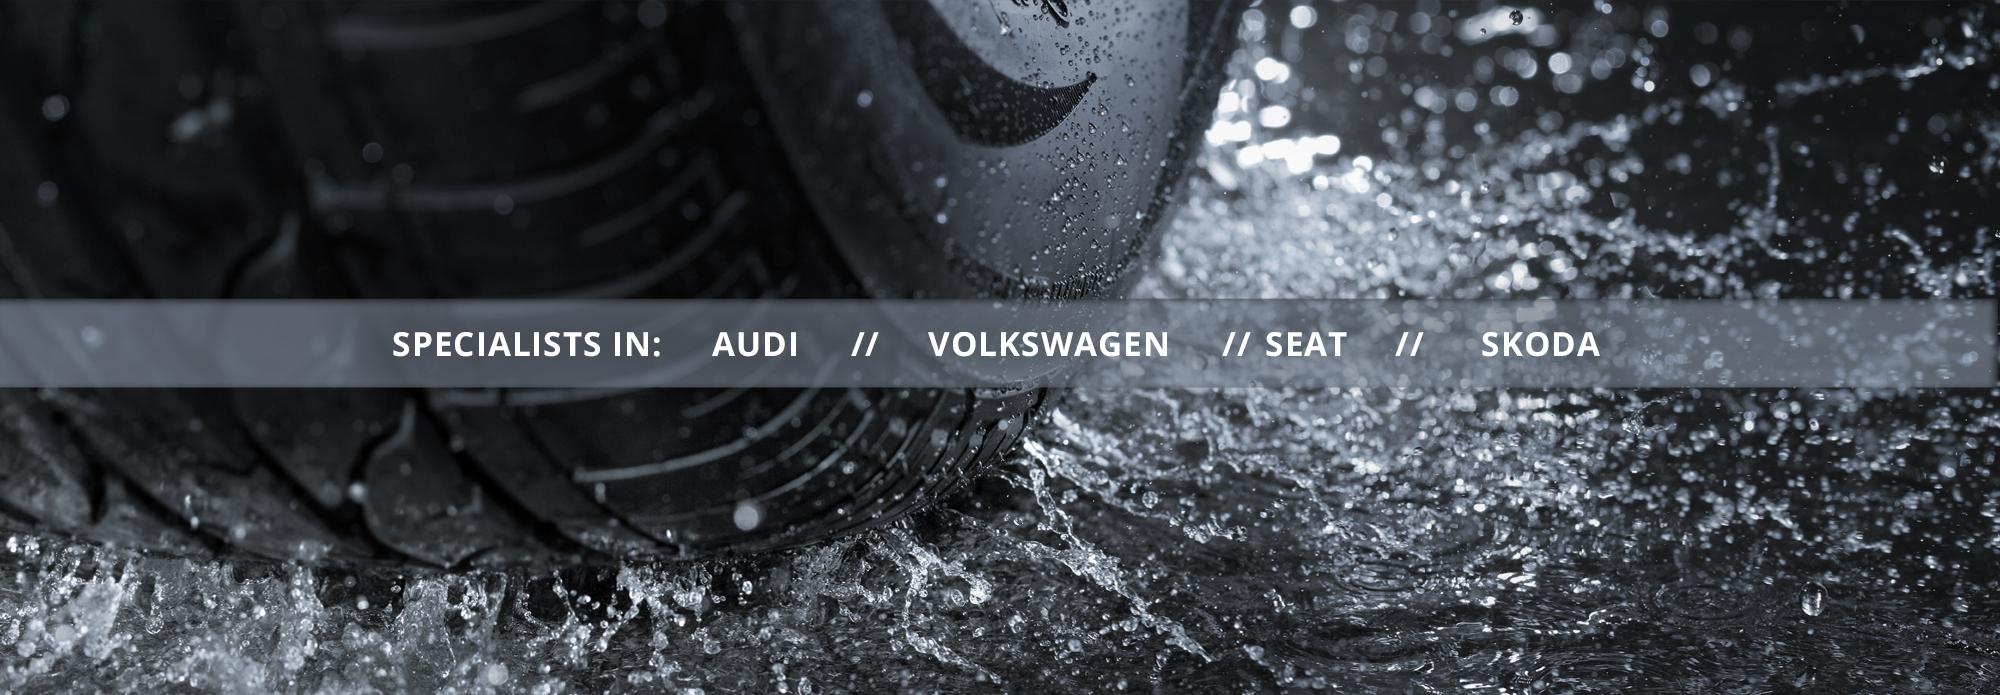 Audi VW Repair Specialist Glasgow - Volkswagen Seat Skoda Audi Specialist Glasgow. Audi Service Glasgow